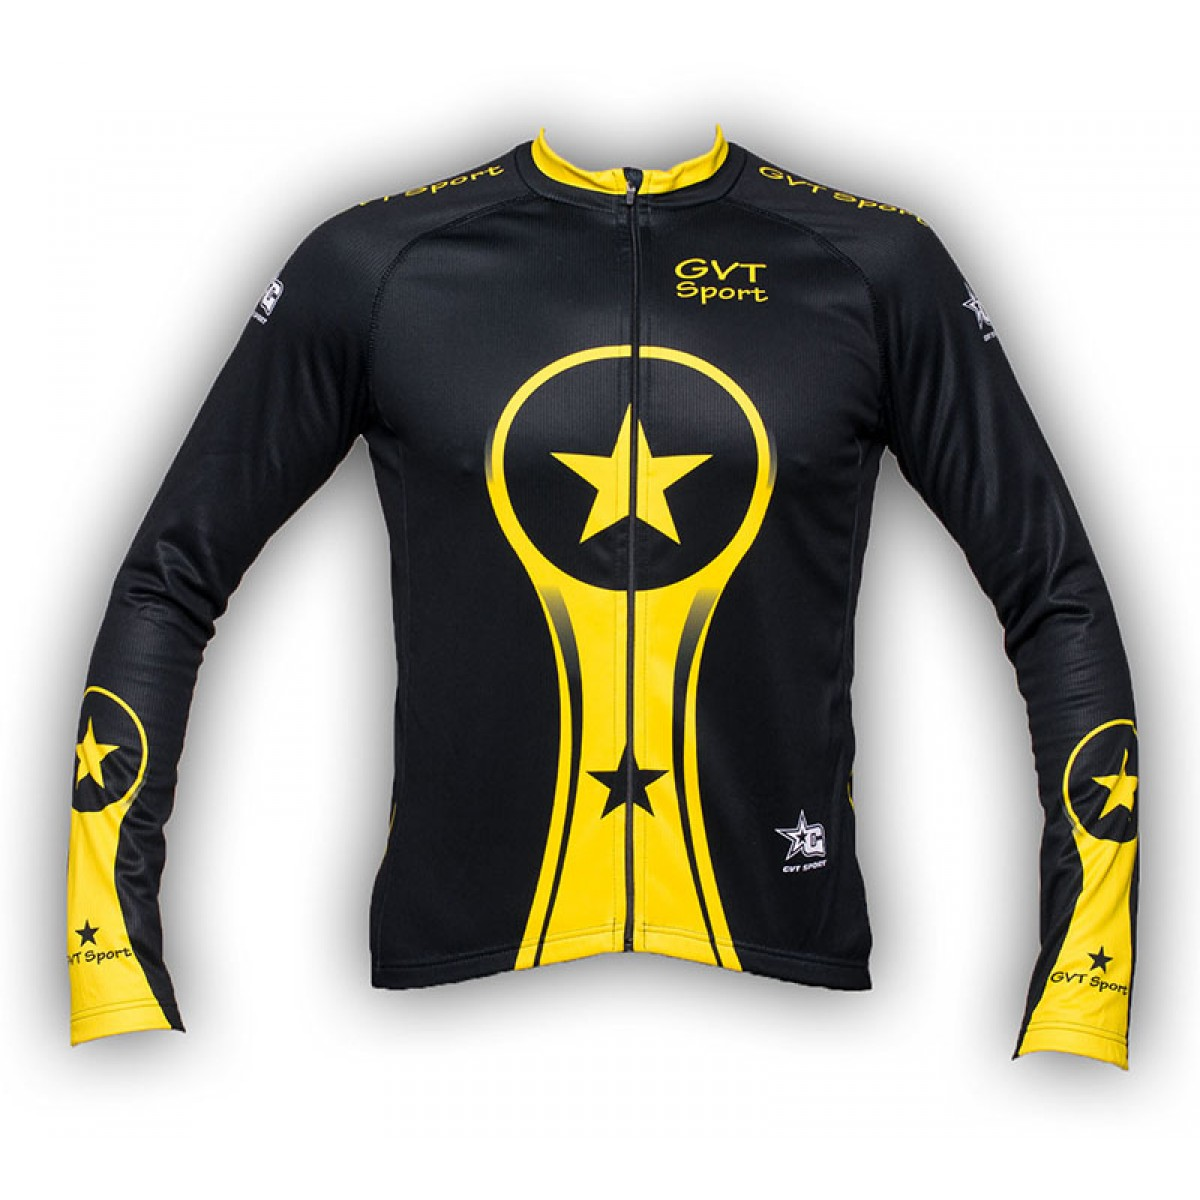 maillot cyclisme manche longue gvt yellows stars. Black Bedroom Furniture Sets. Home Design Ideas